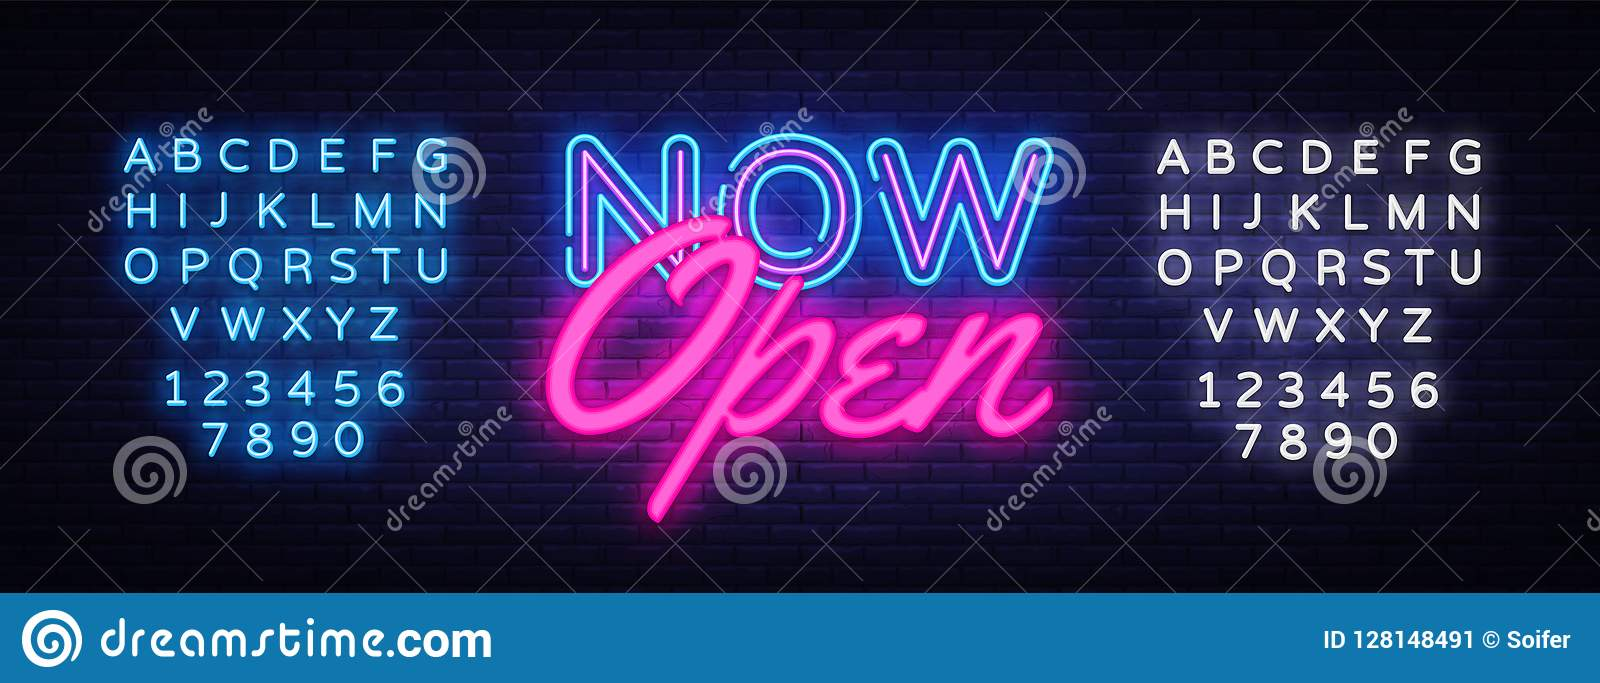 Now Open neon text vector design template. Now Open neon logo, light banner design element colorful modern design trend